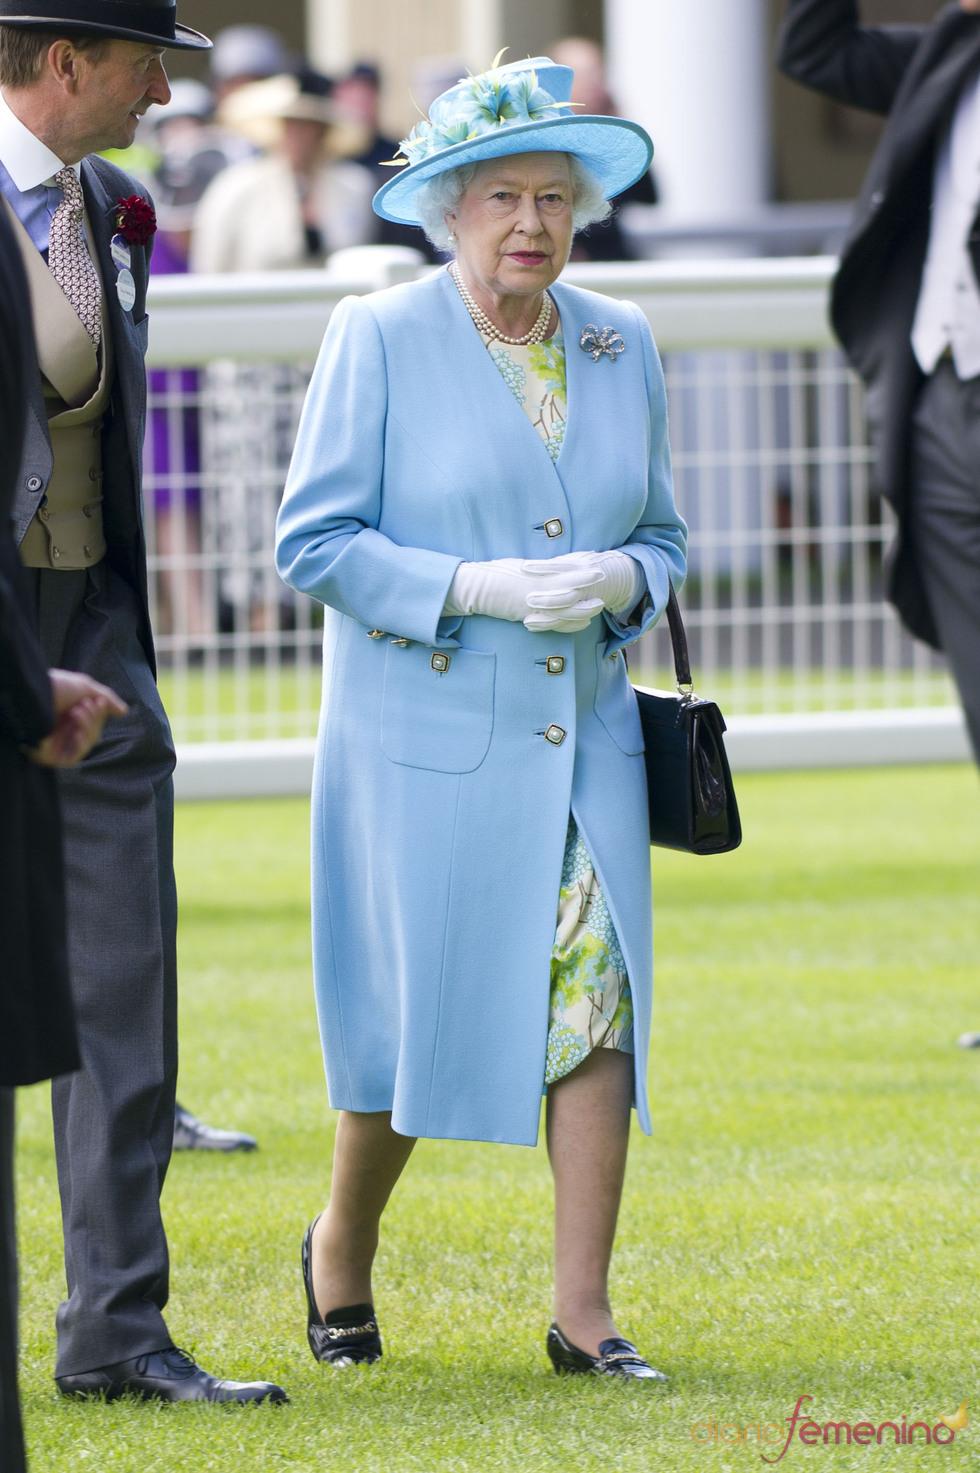 La Reina Isabel II en la clausura de las carreras de caballos de Ascot